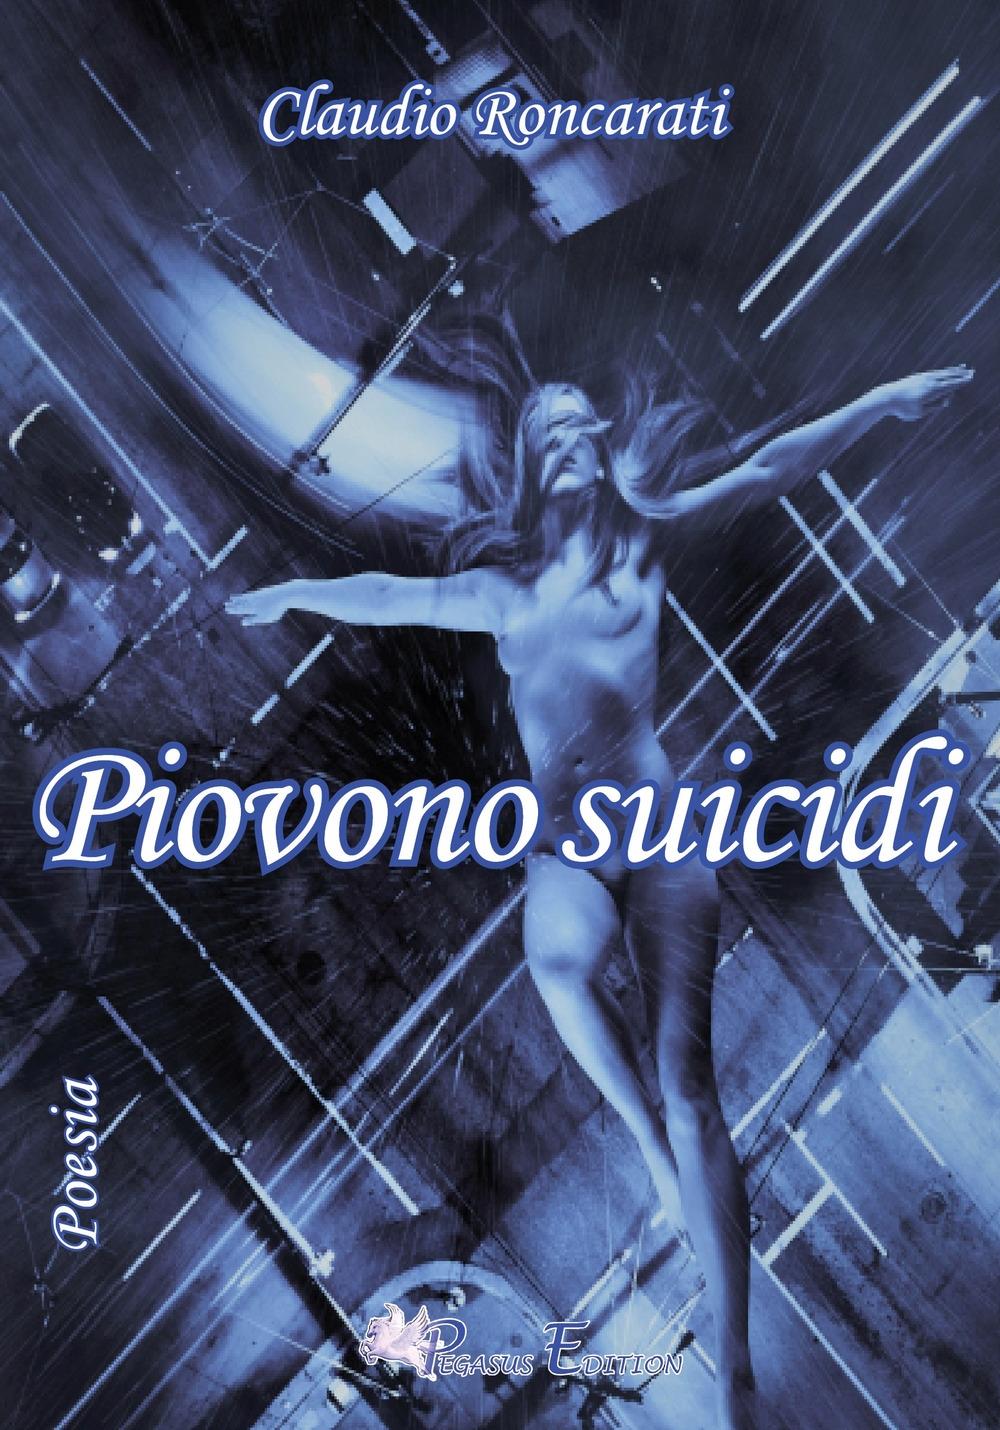 Piovono suicidi